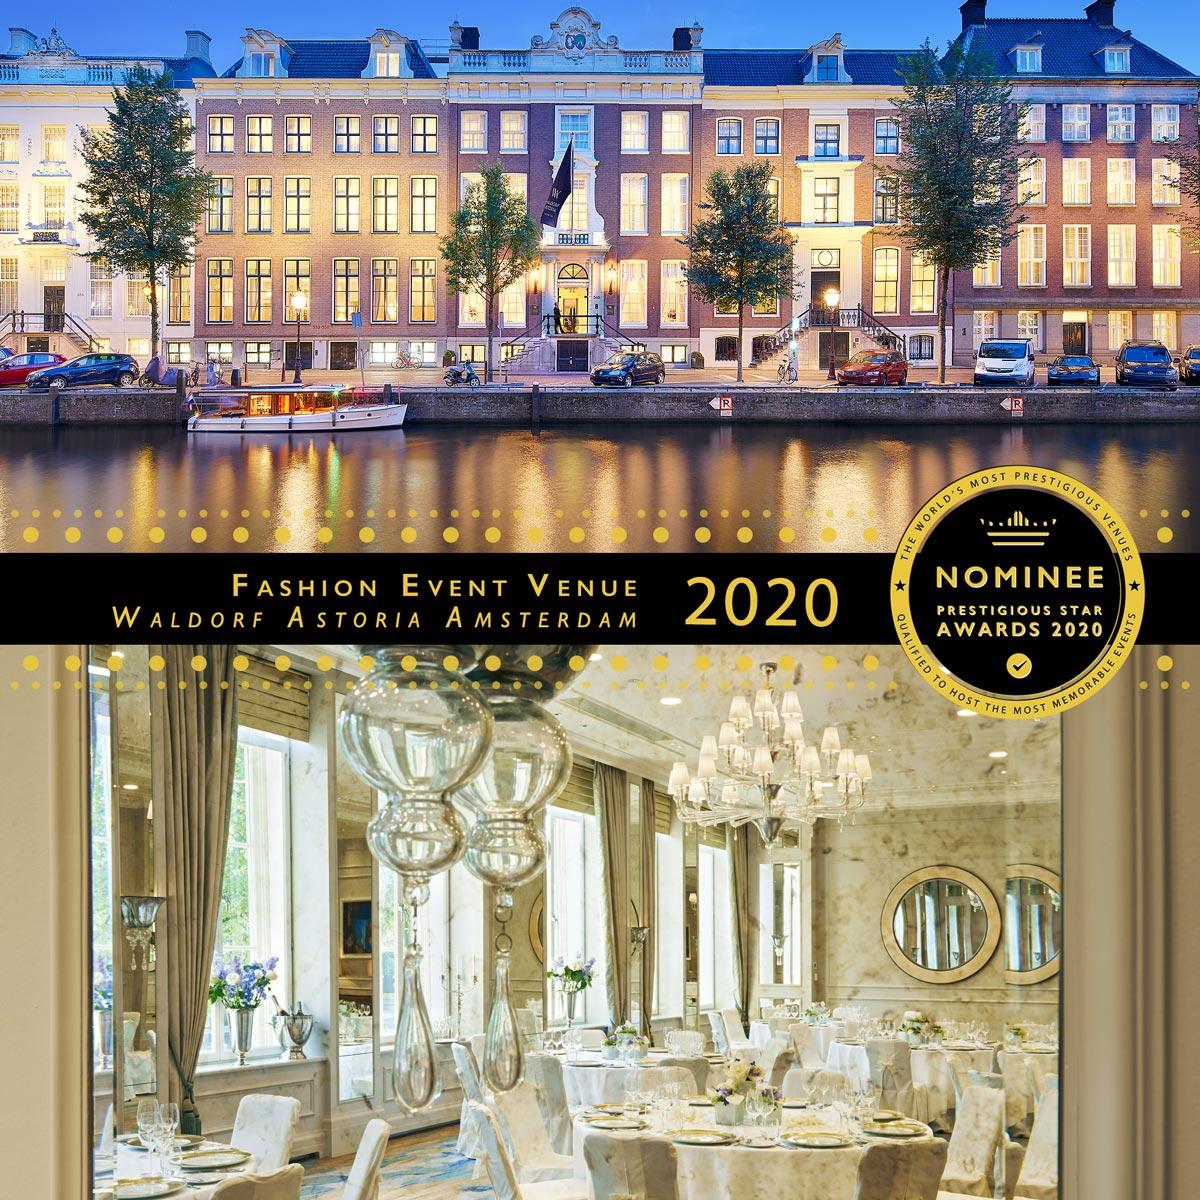 Hooft Ballroom at Waldorf Astoria Amsterdam